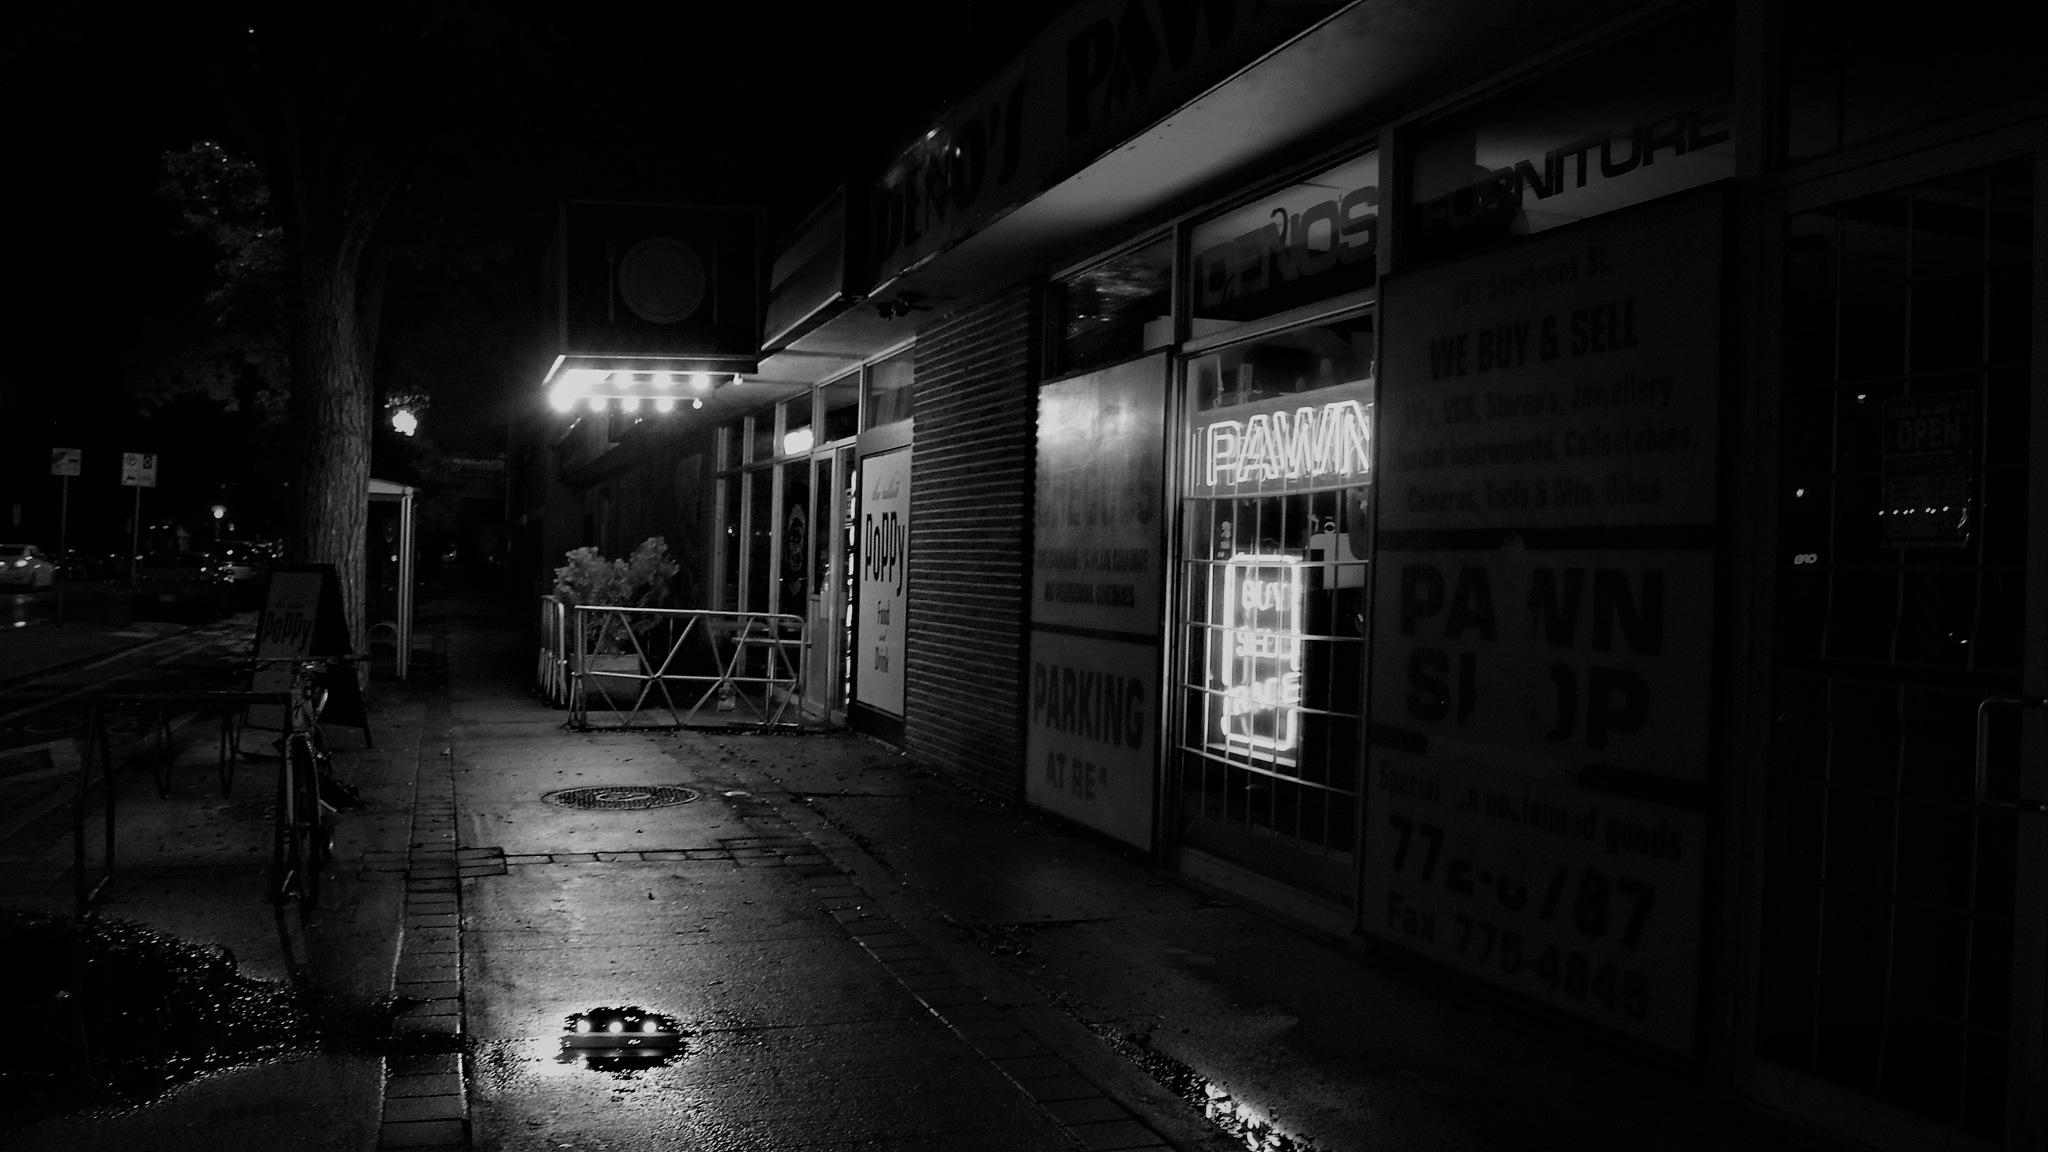 Noirish by David Imrie